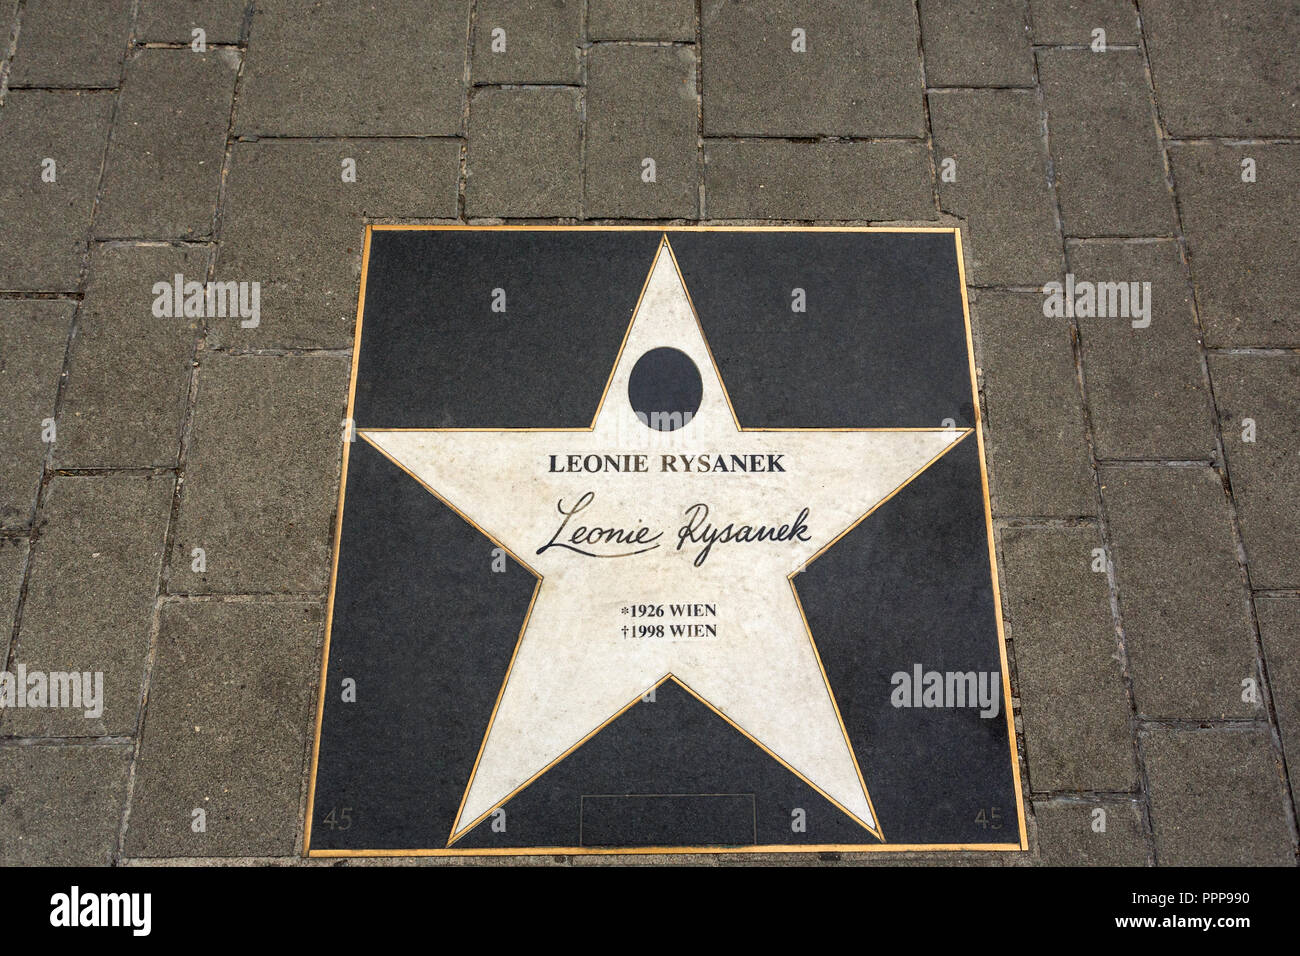 VIENNA, AUSTRIA - JUNE 27, 2015: The star of Leonie Rysanek on the boulevard near State Opera in Vienna, Austria - Stock Image